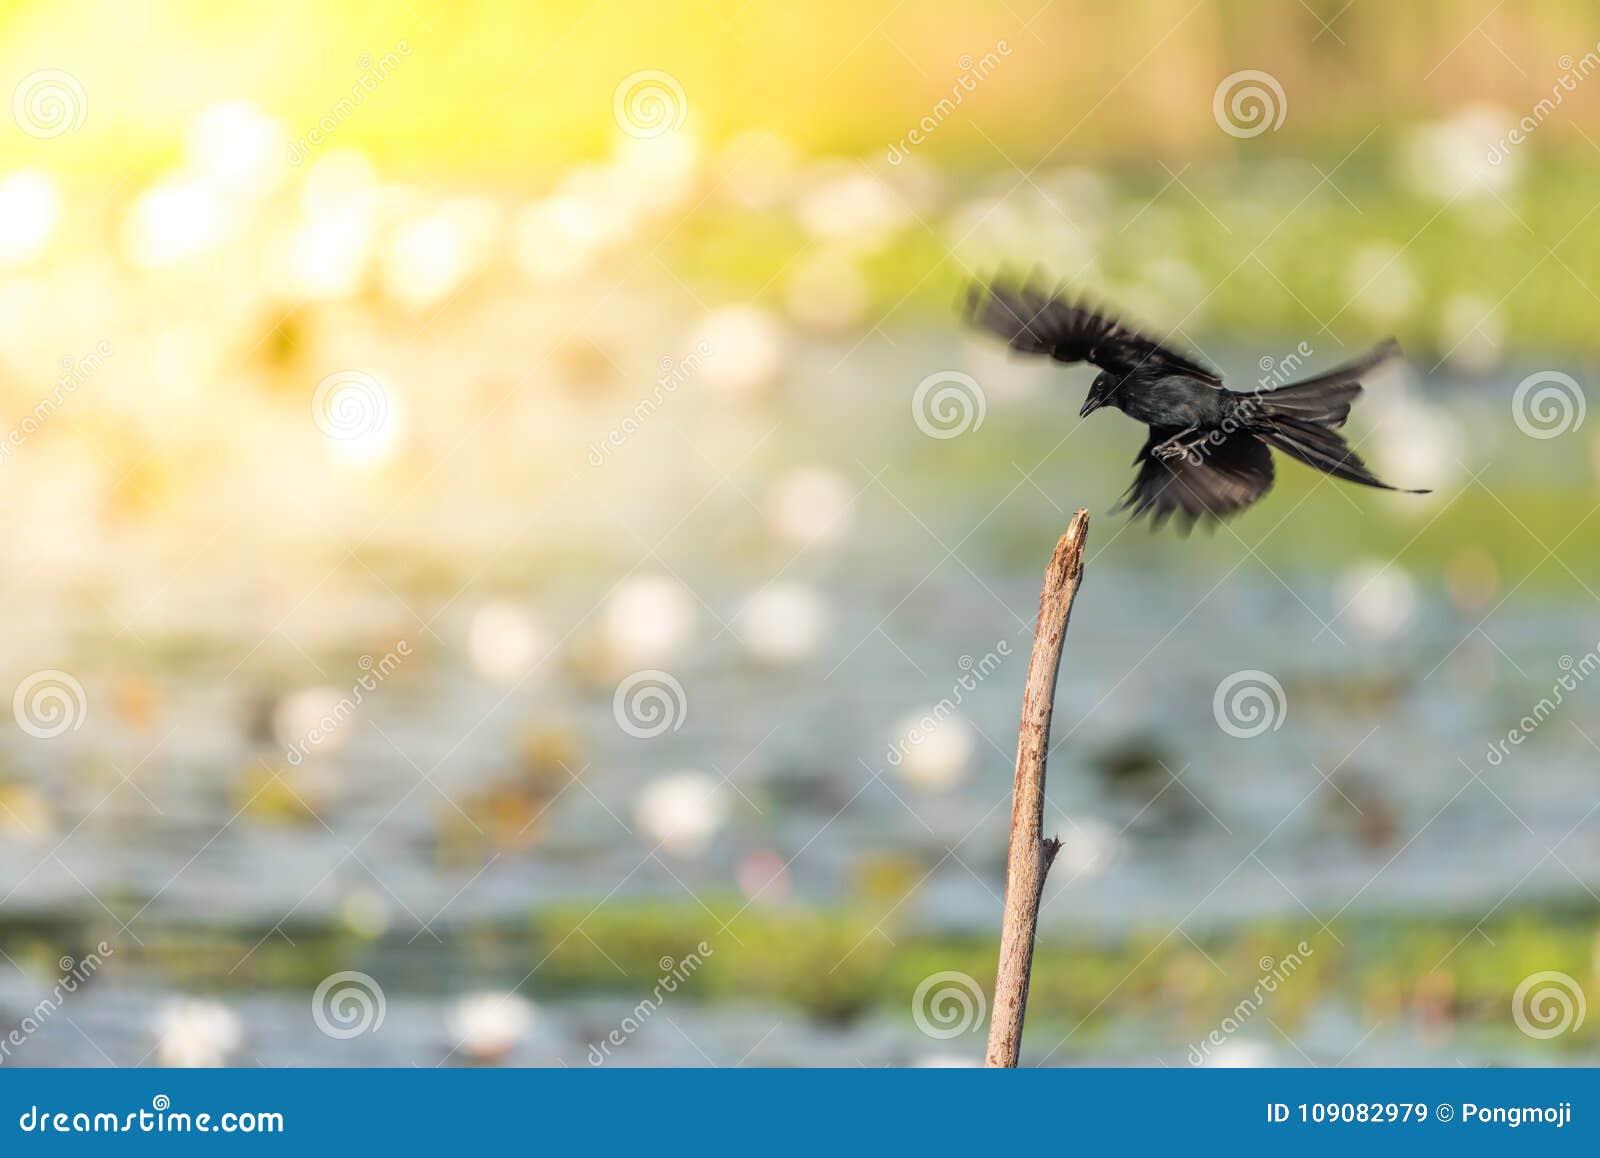 Bird (Black Drongo) On Tree In Nature Wild Stock Image ...